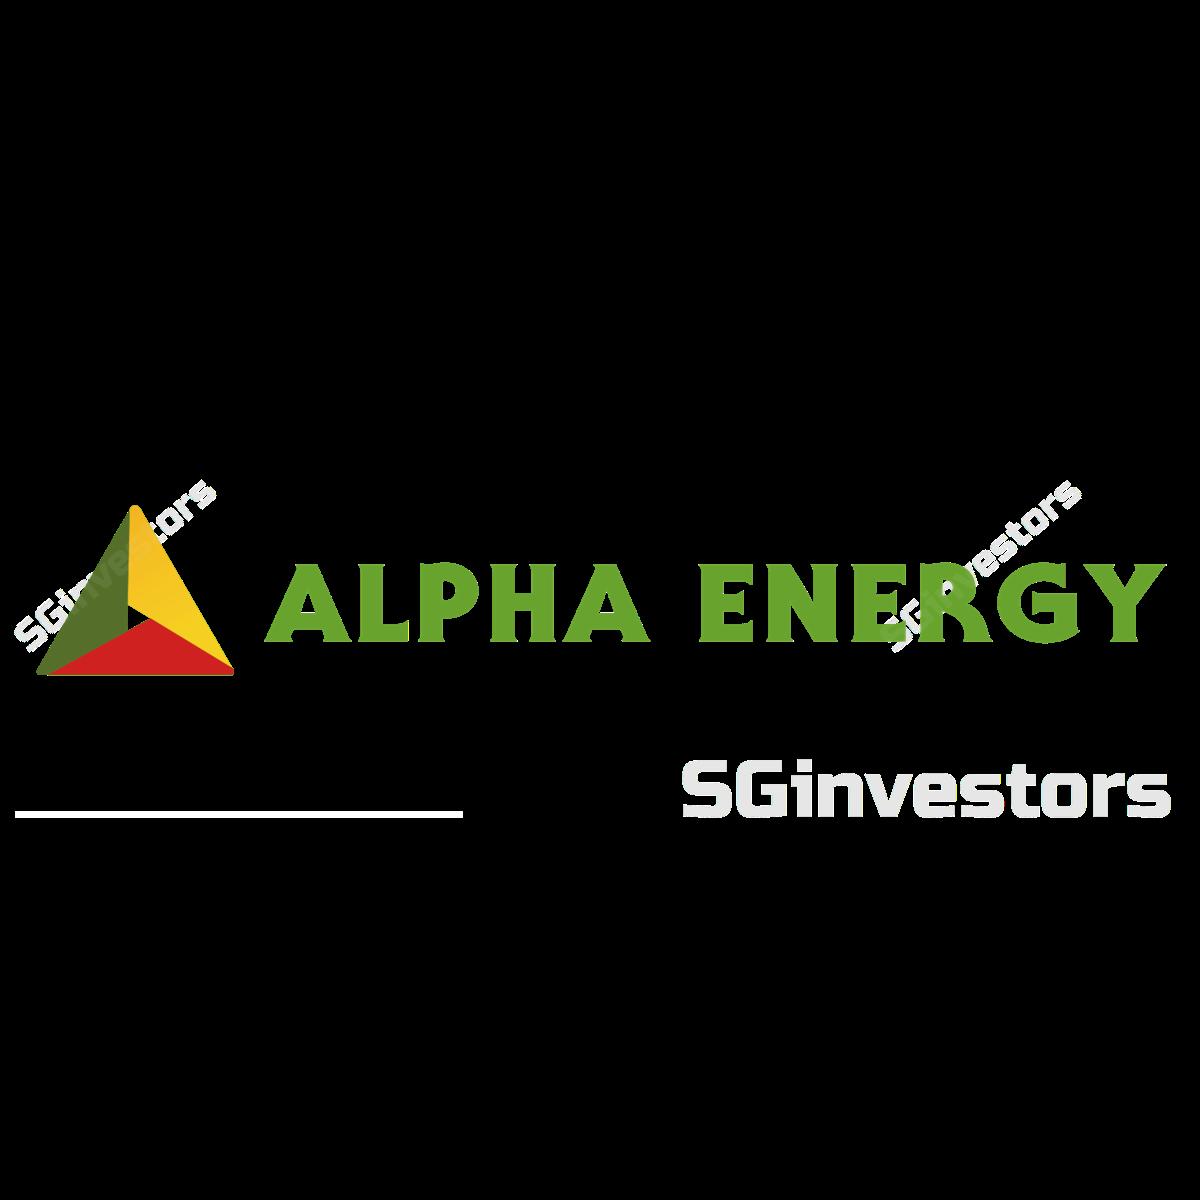 alpha energy share price history sgx 5ts sg. Black Bedroom Furniture Sets. Home Design Ideas